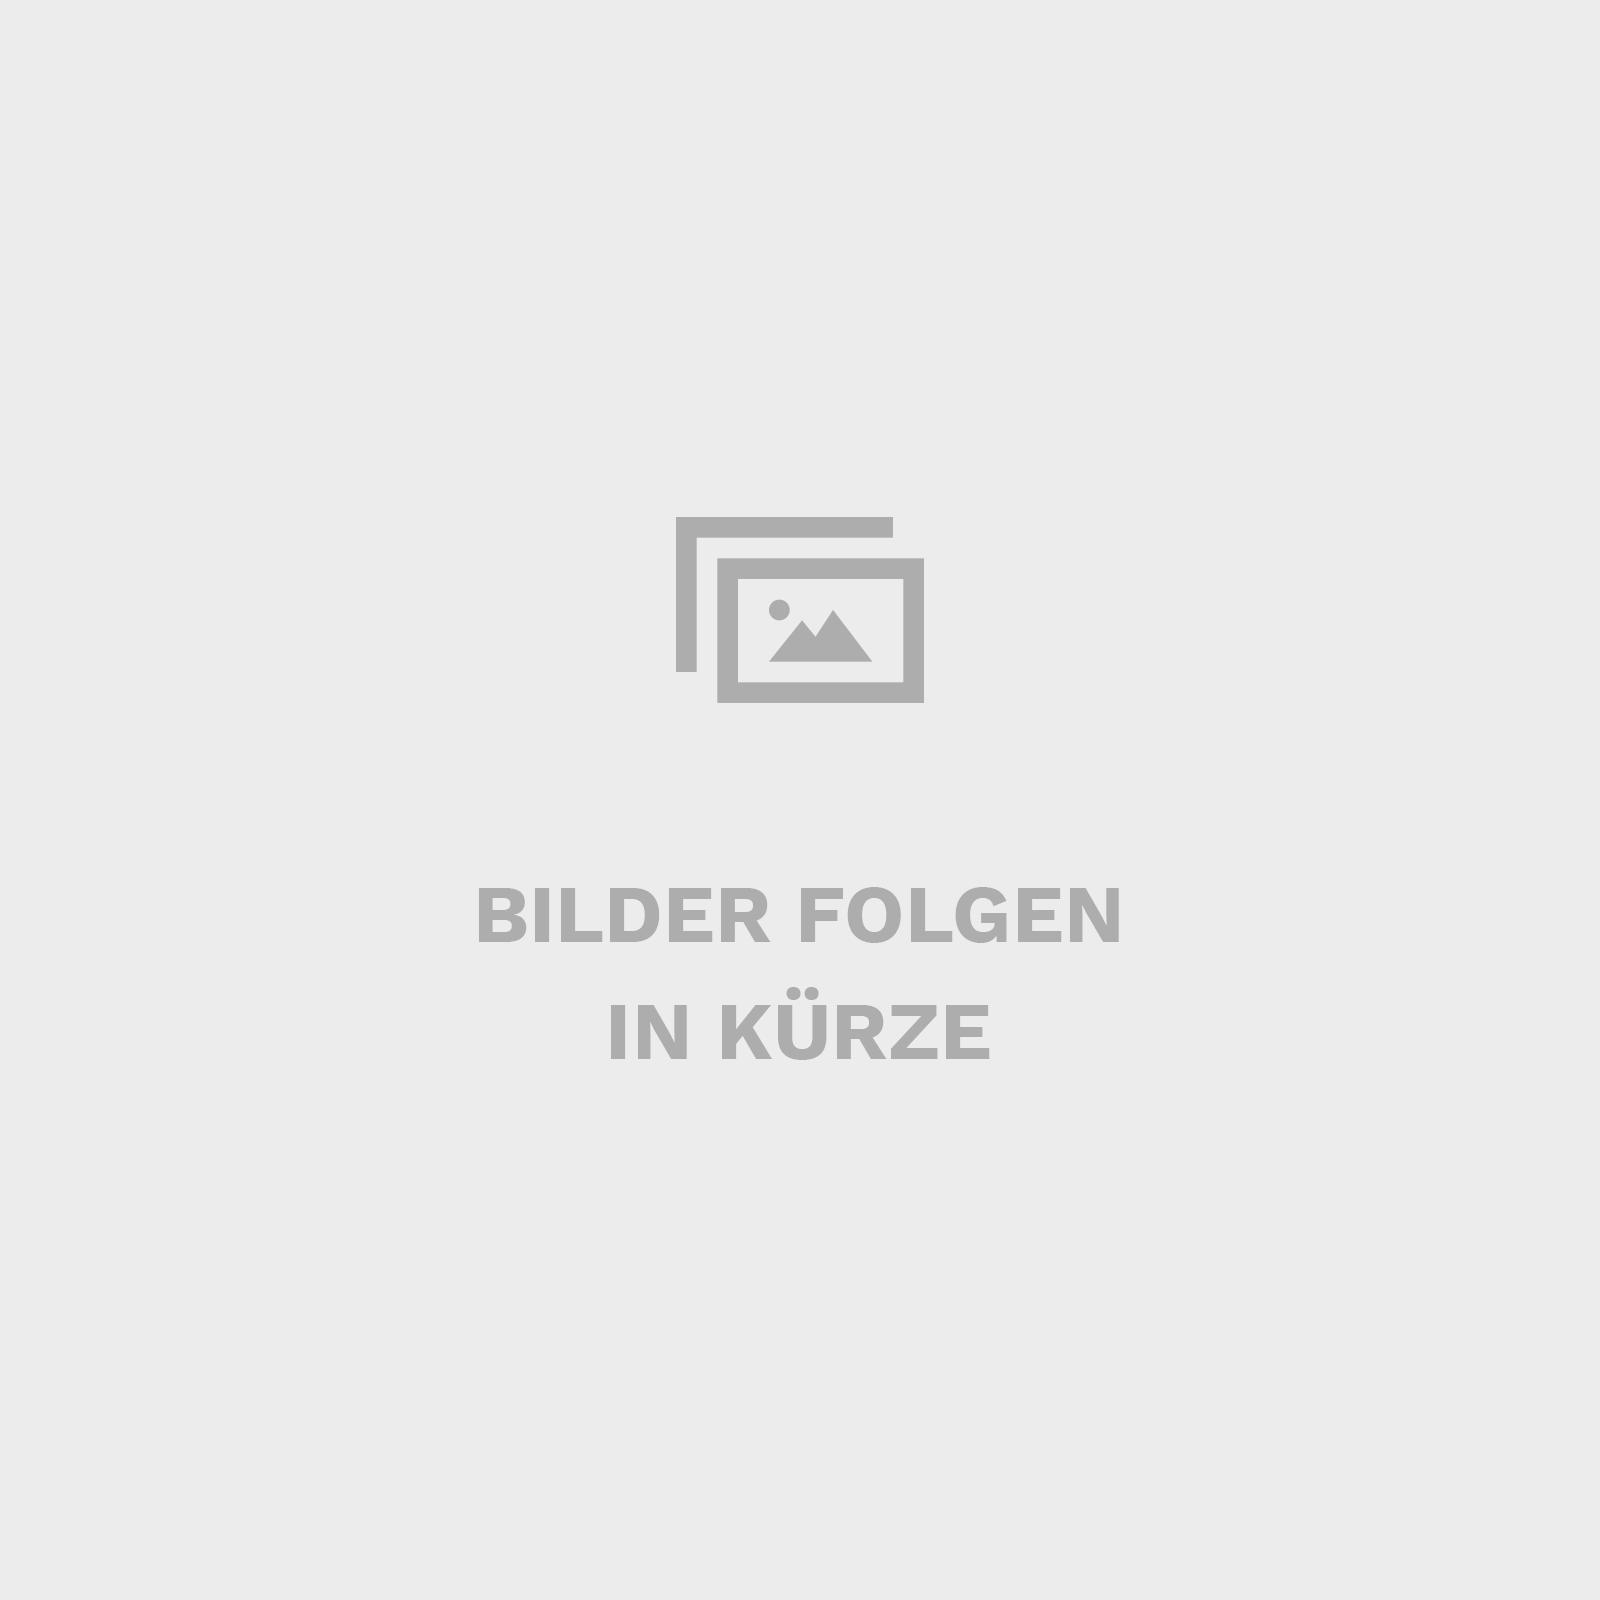 teppich tosh 1400 von object carpet f r 93 67. Black Bedroom Furniture Sets. Home Design Ideas